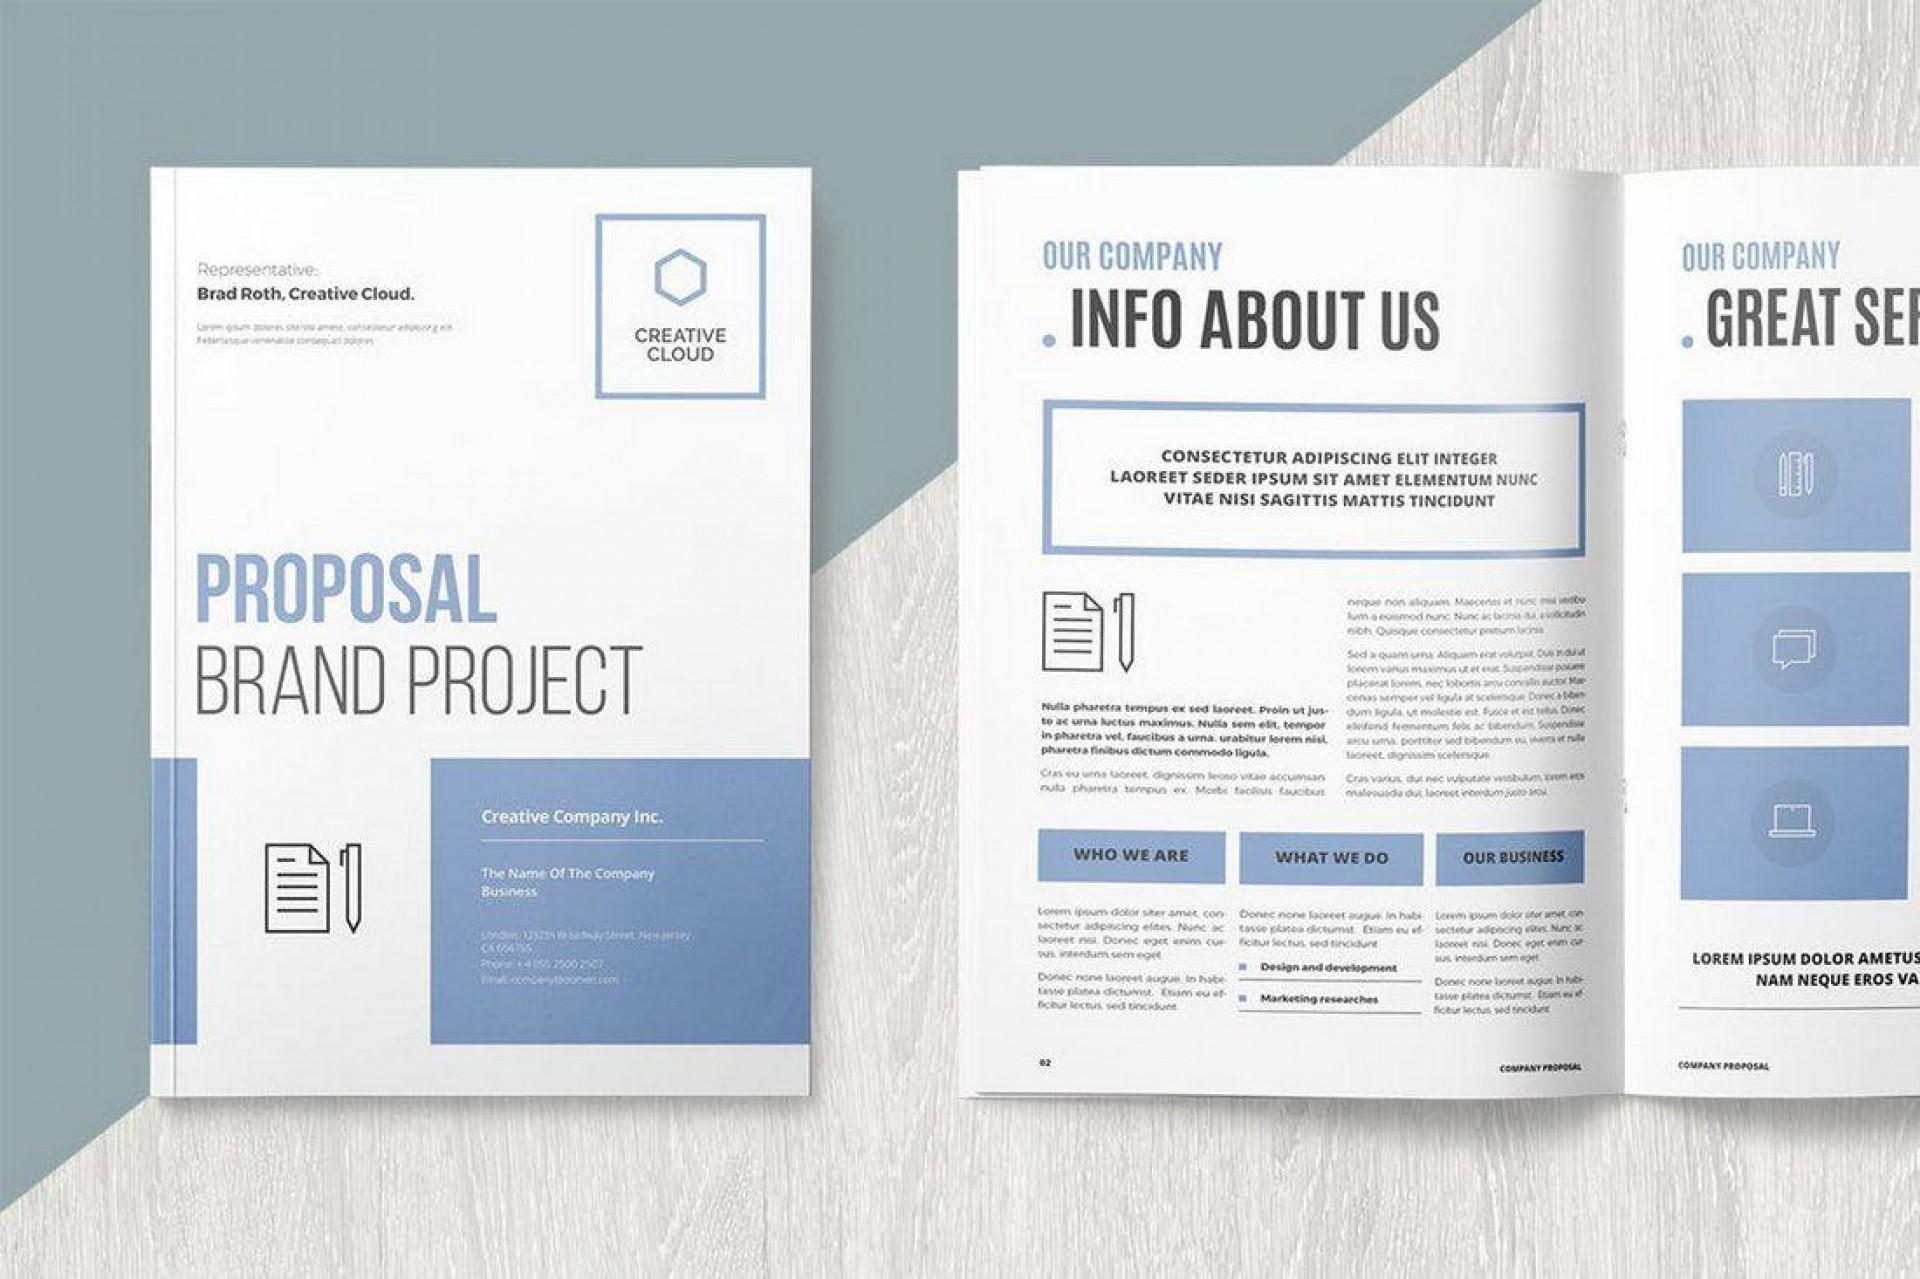 002 Phenomenal Microsoft Word Brochure Template Photo  Templates 2010 Tri Fold A4 2007 Free Download1920